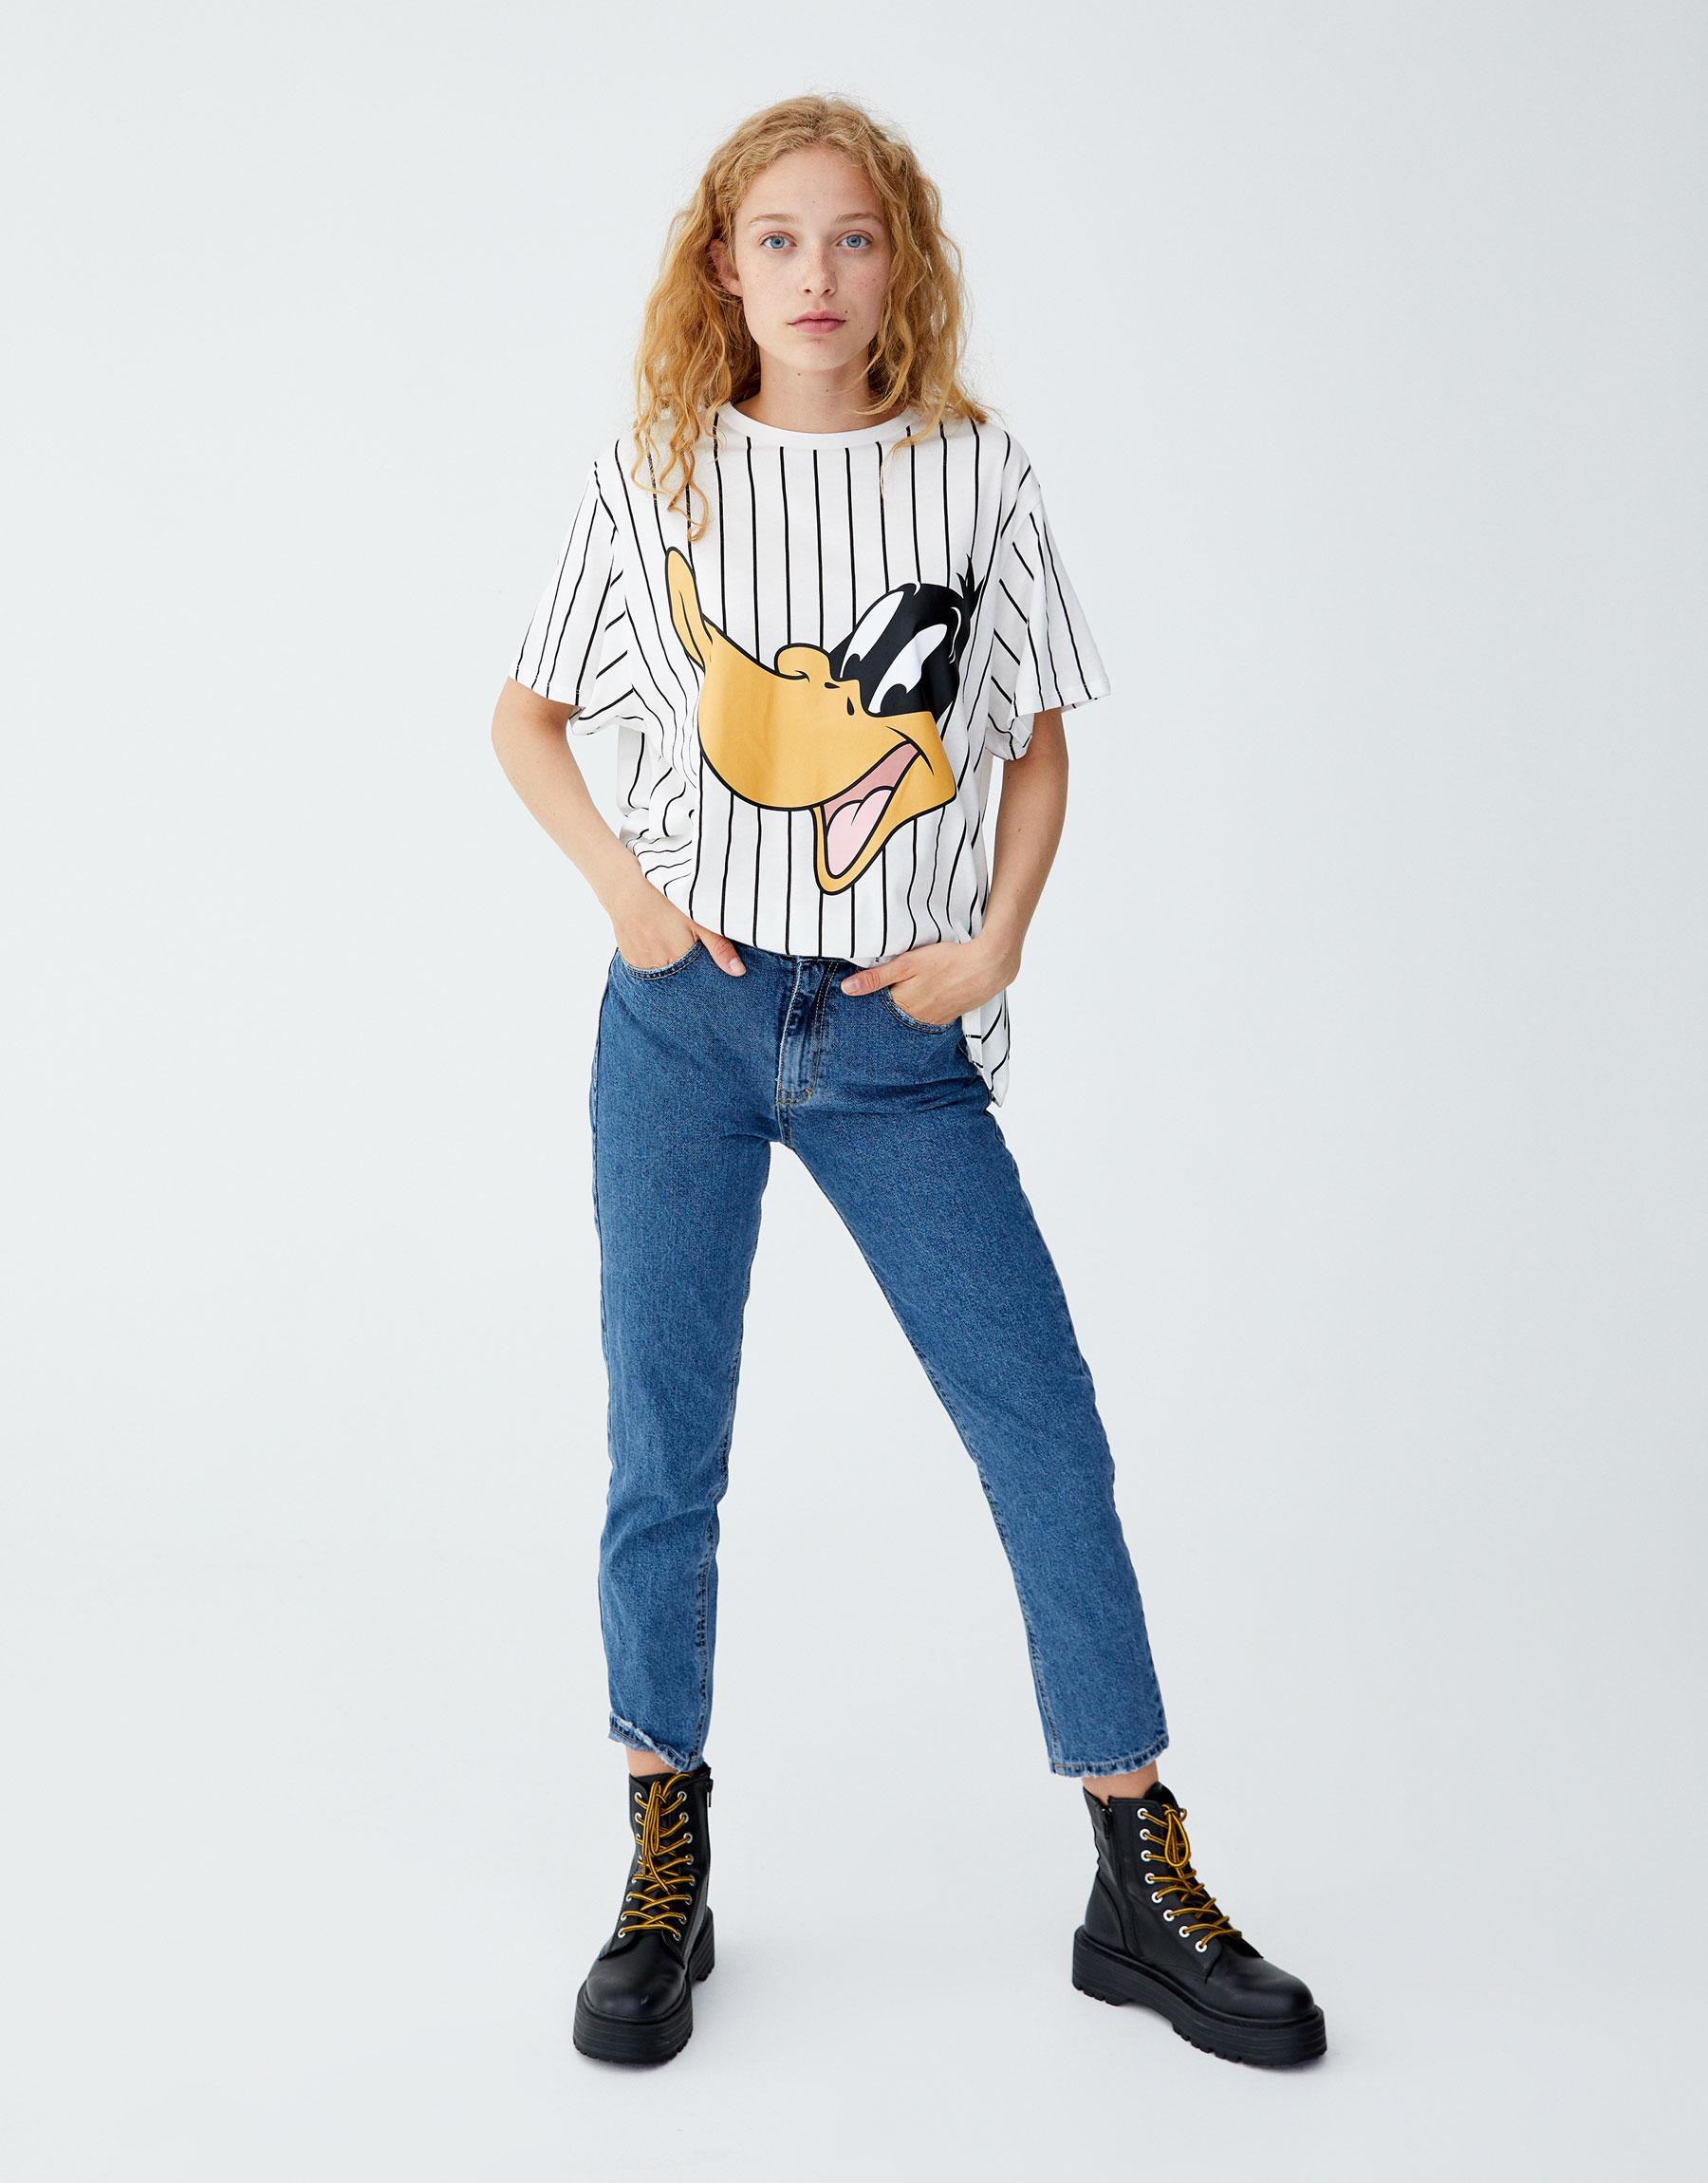 Imagen principal de producto de Camiseta Pato Lucas - Pull & Bear